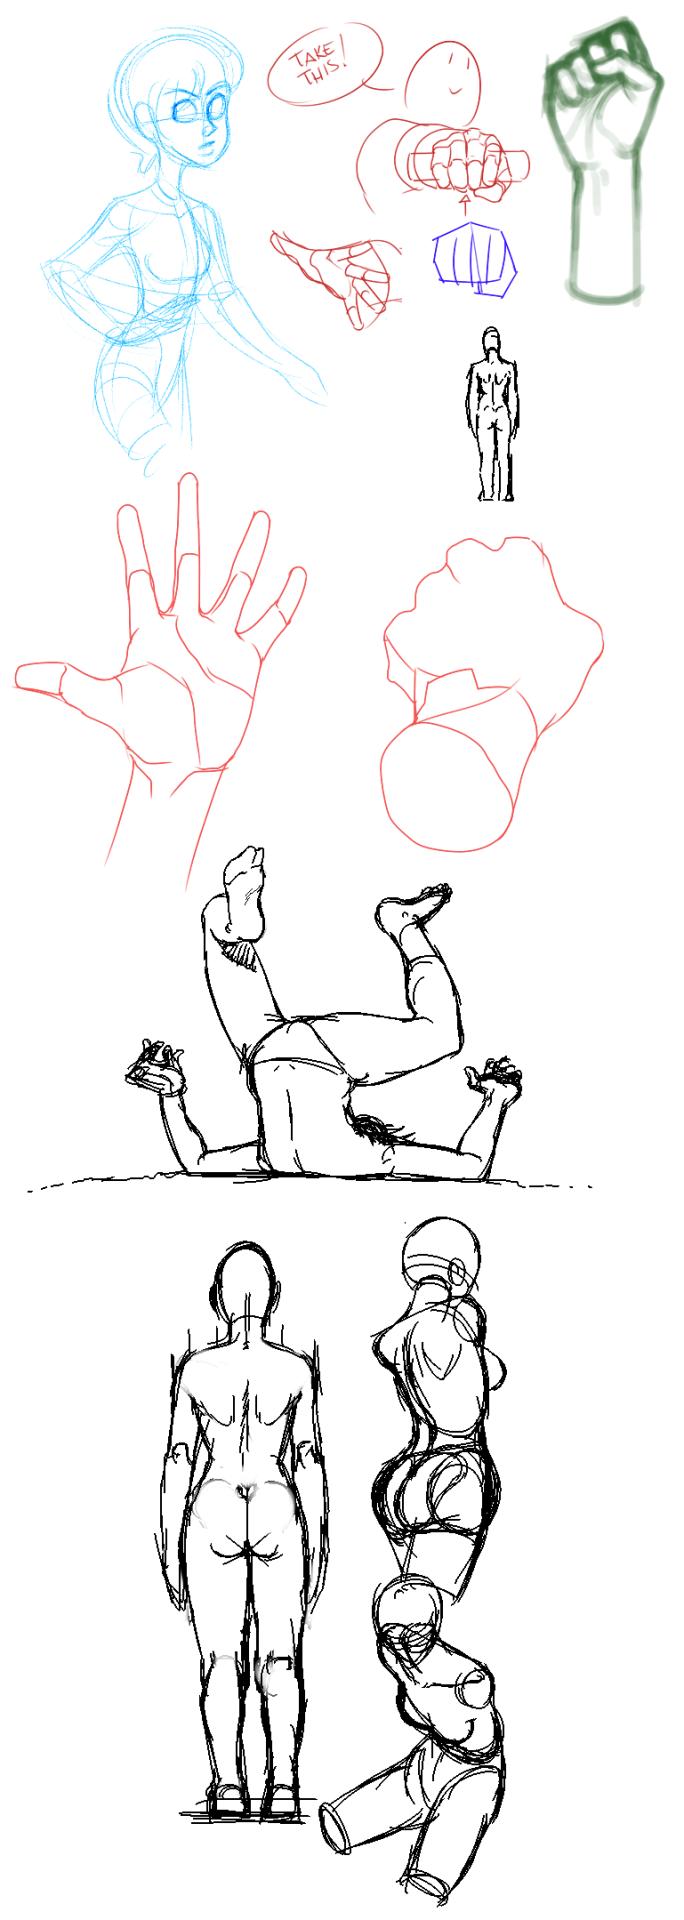 Leo's crazy sketchbook - Page 5 Tumblr_mq5xfftH6r1r9rj3ko3_1280